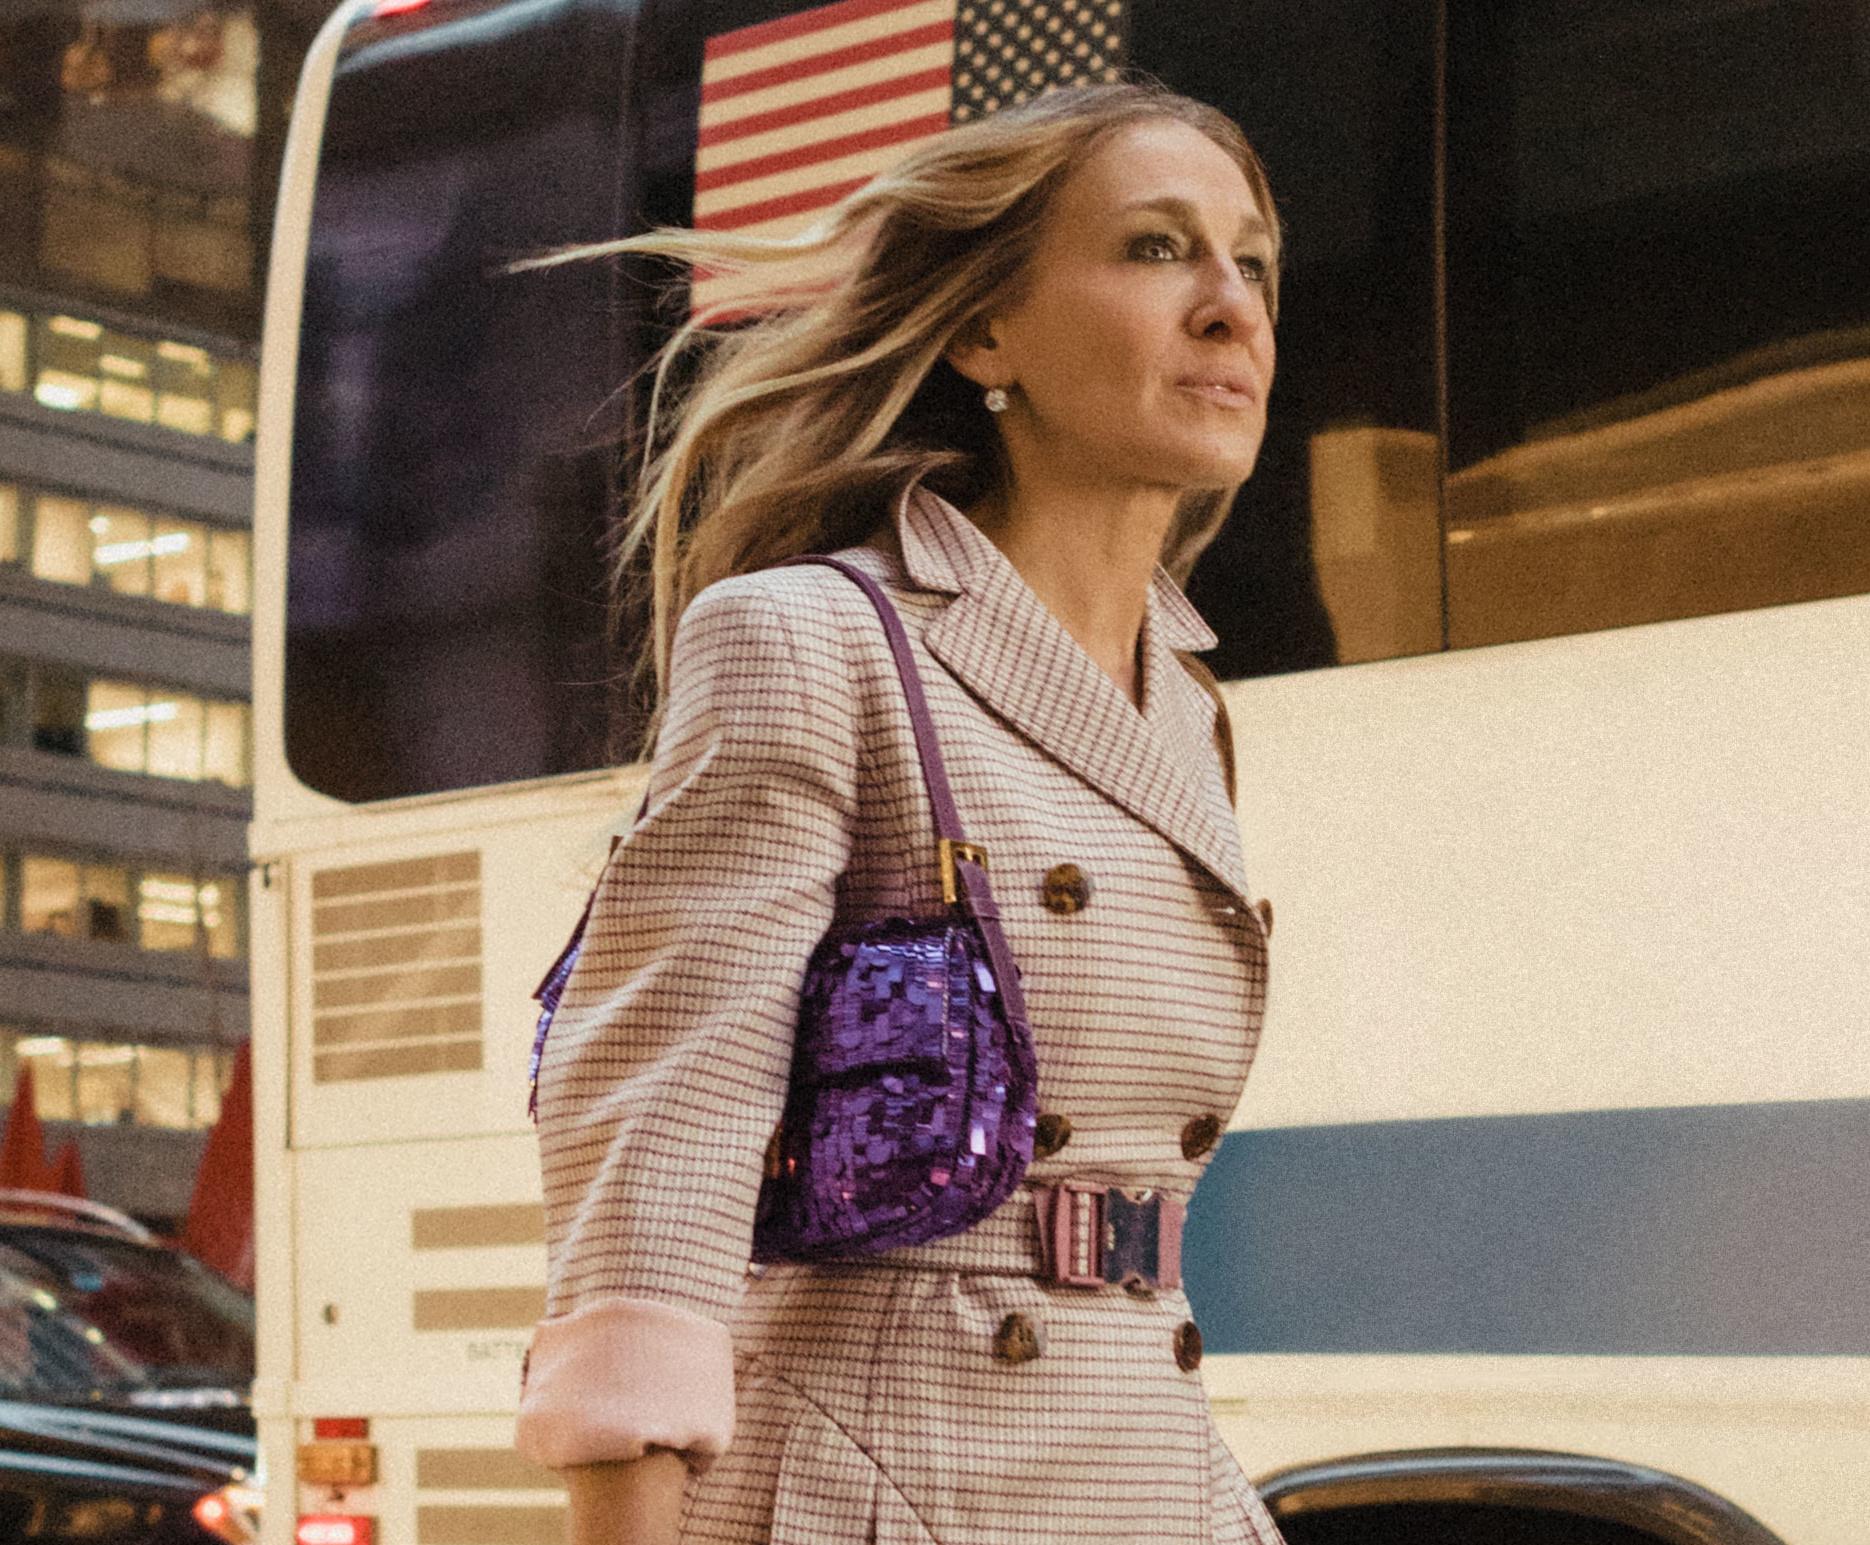 Carrie Bradshaw con bolso baguette color lila